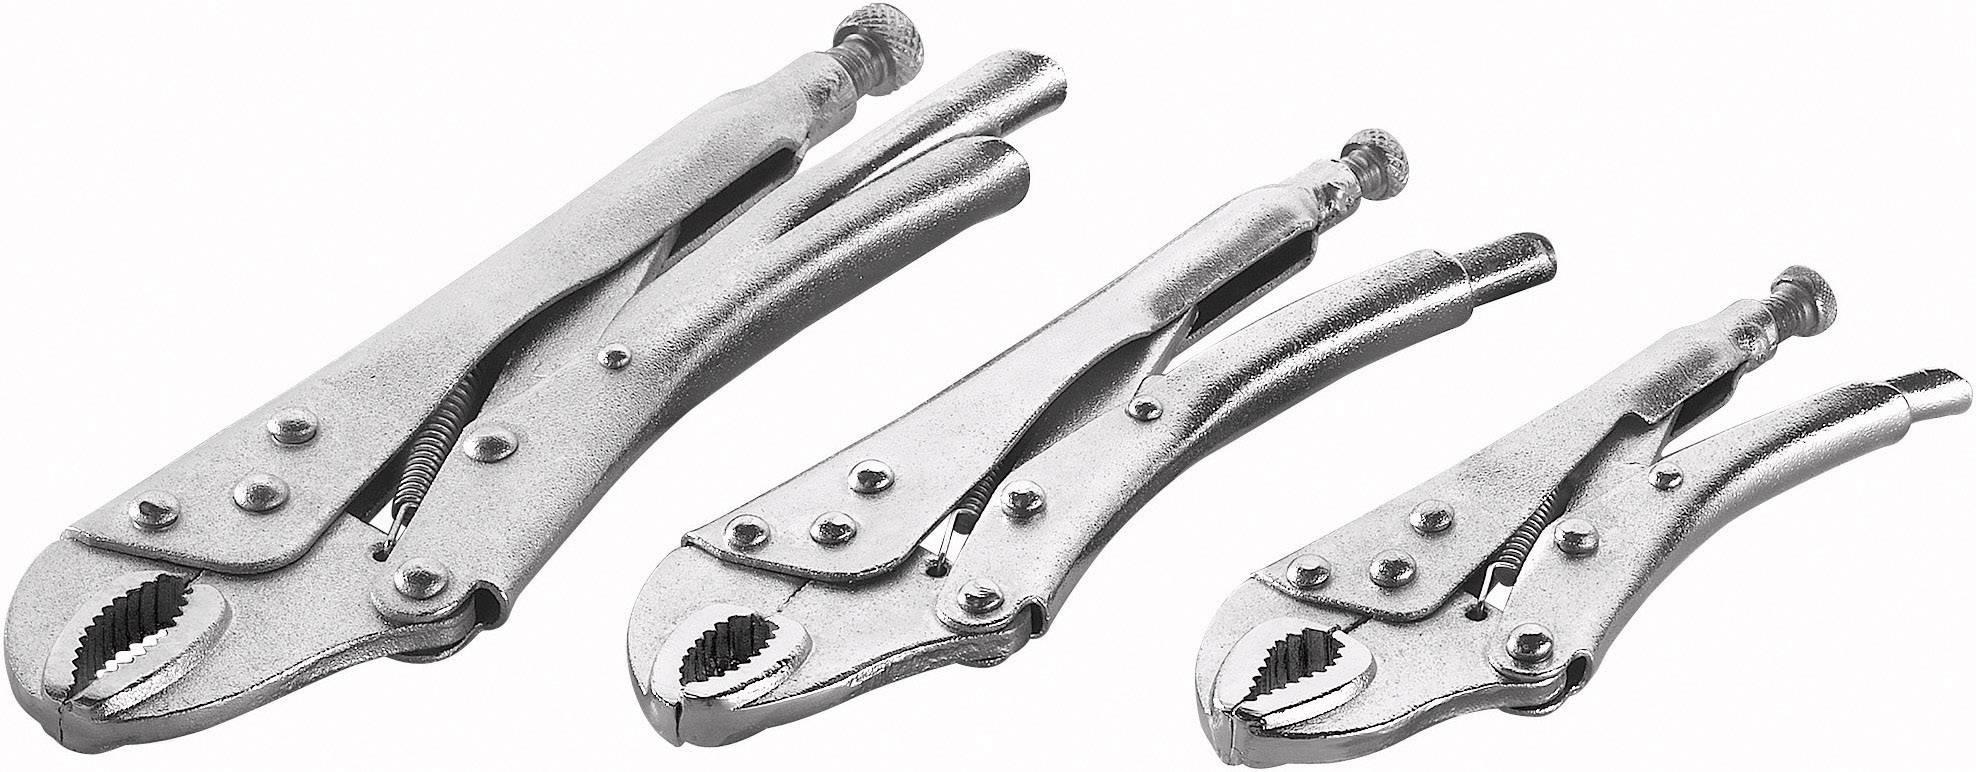 Sada samosvorných kleští Basetech, 140 - 220 mm, 3 ks